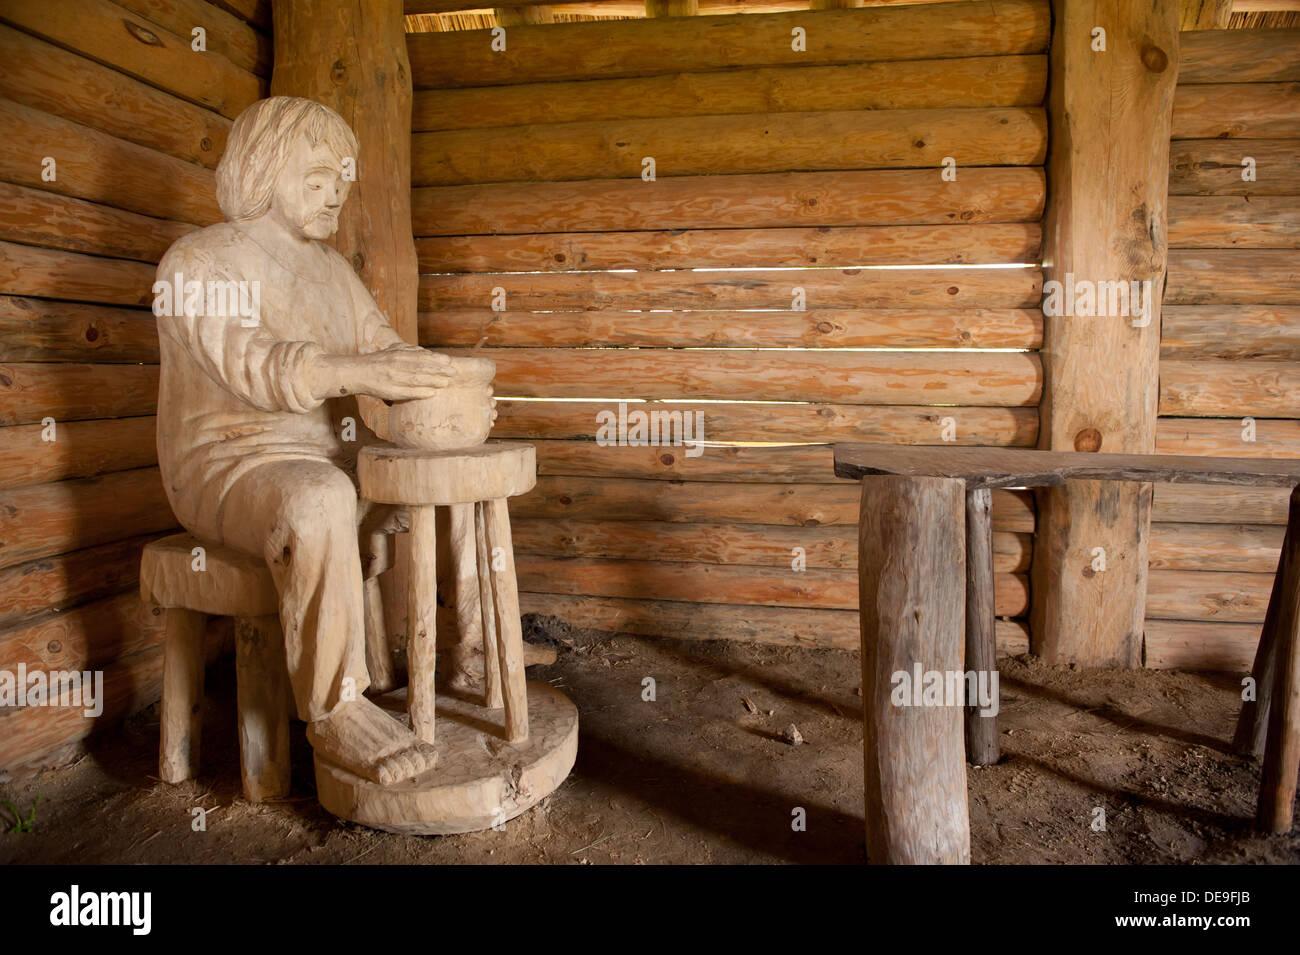 Slav worker sculpture inside hut Stock Photo